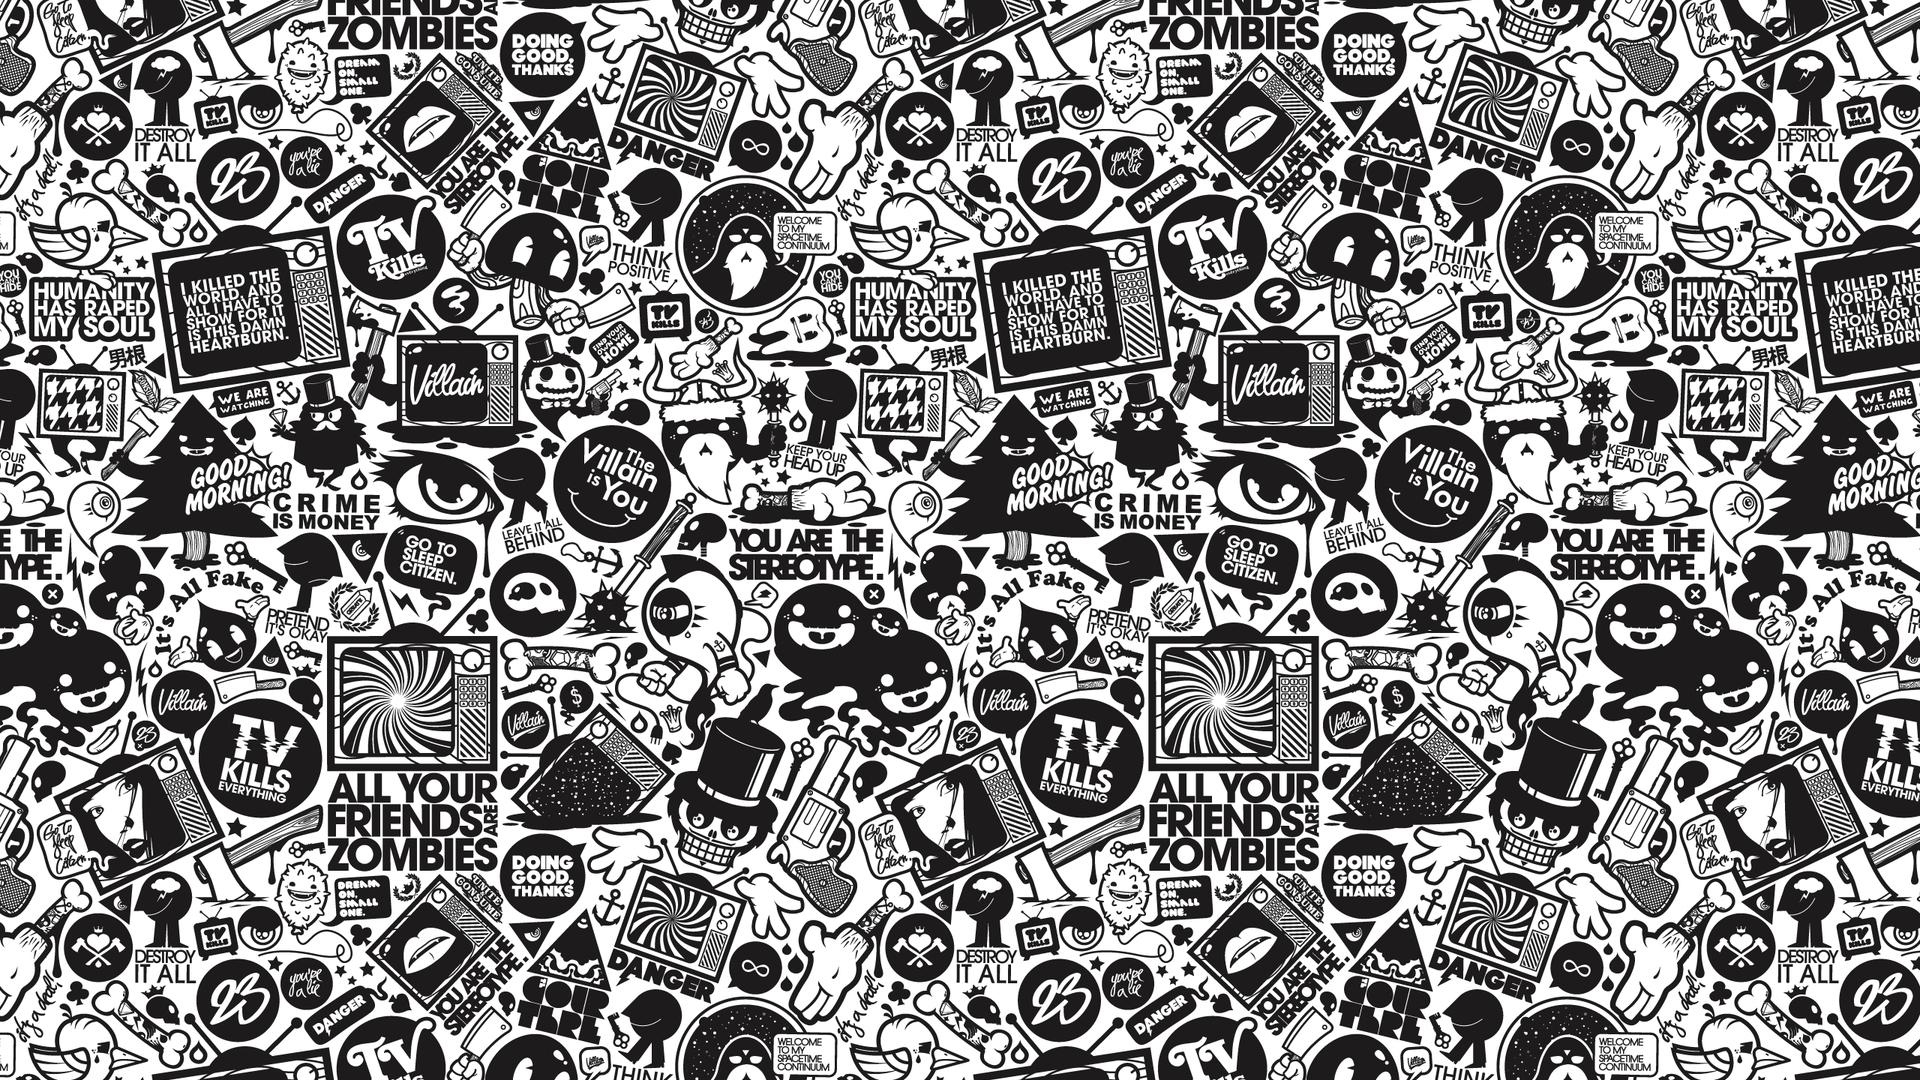 White and Black Wallpaper Designs Desktop Image 1920x1080